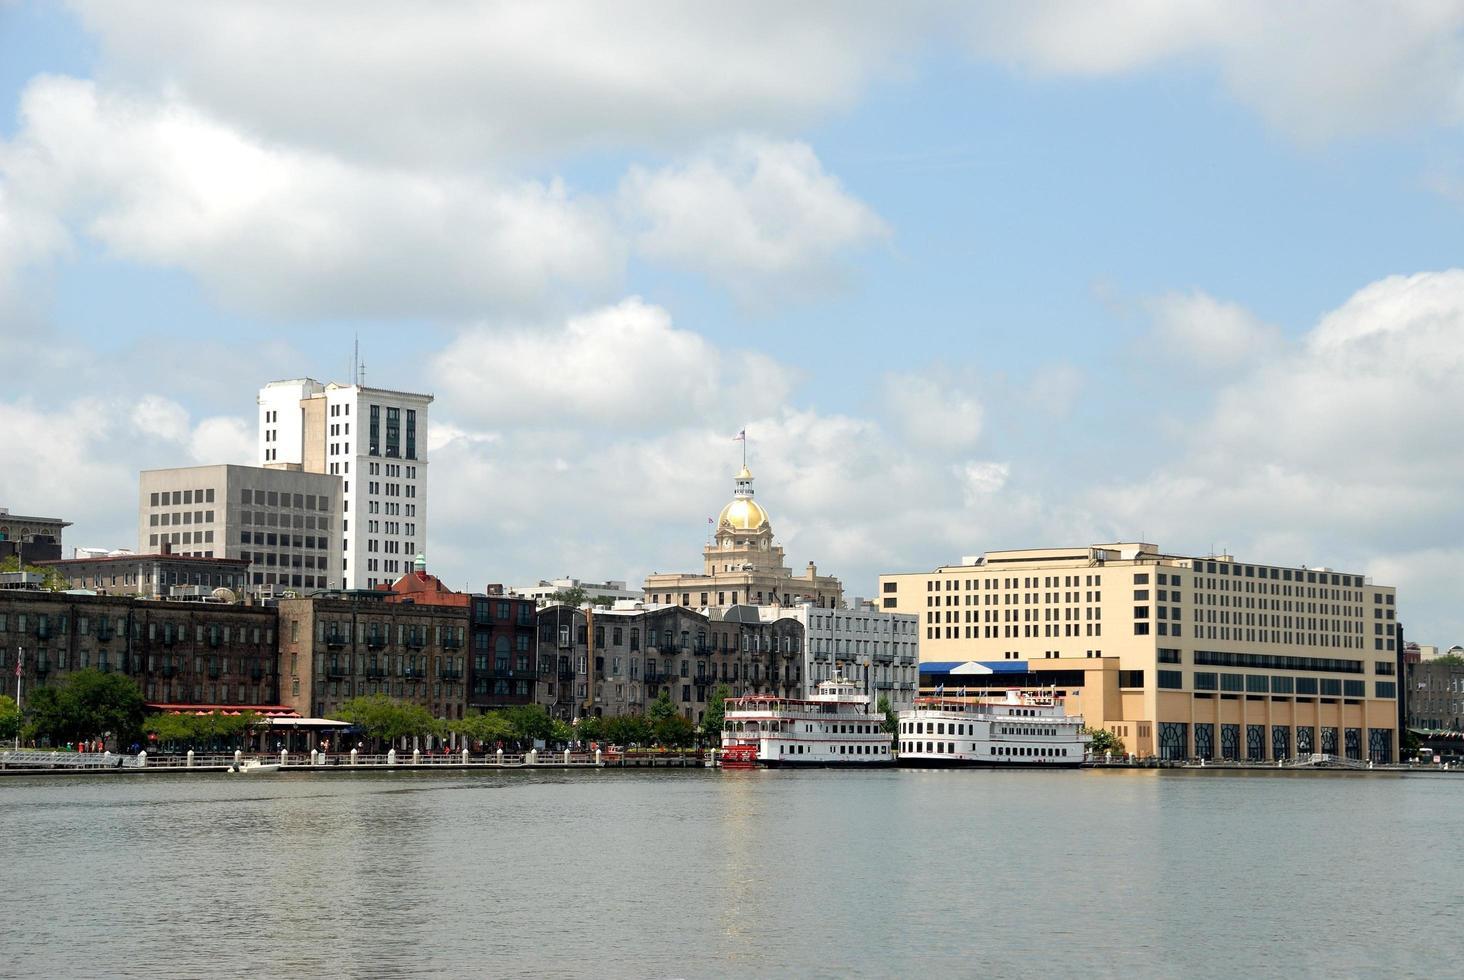 Riverfront à Savannah, Géorgie photo